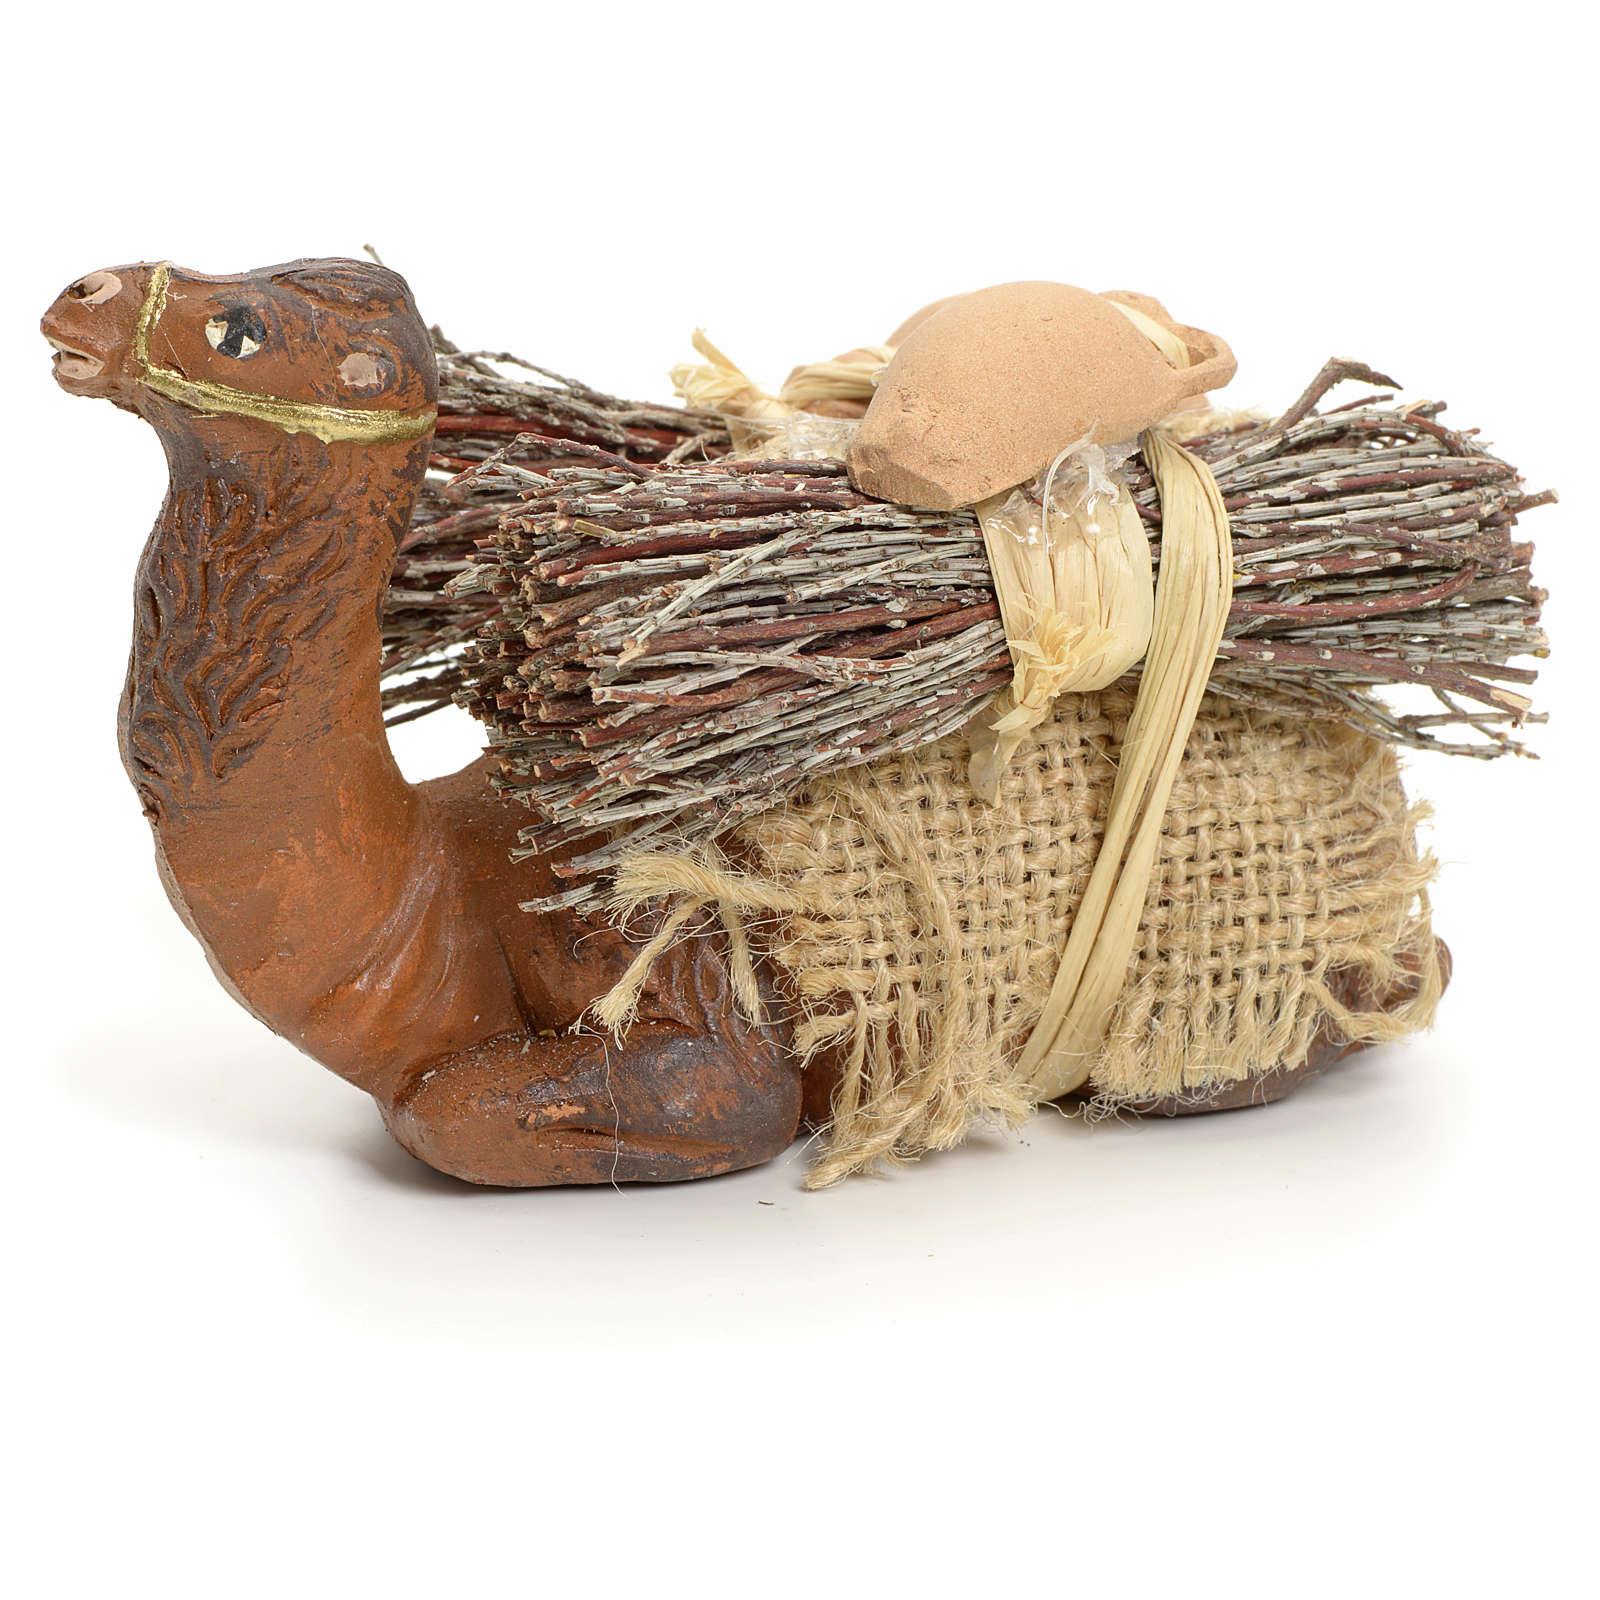 Neapolitan Nativity figurine, kneeling camel with wood bundle, 8 4